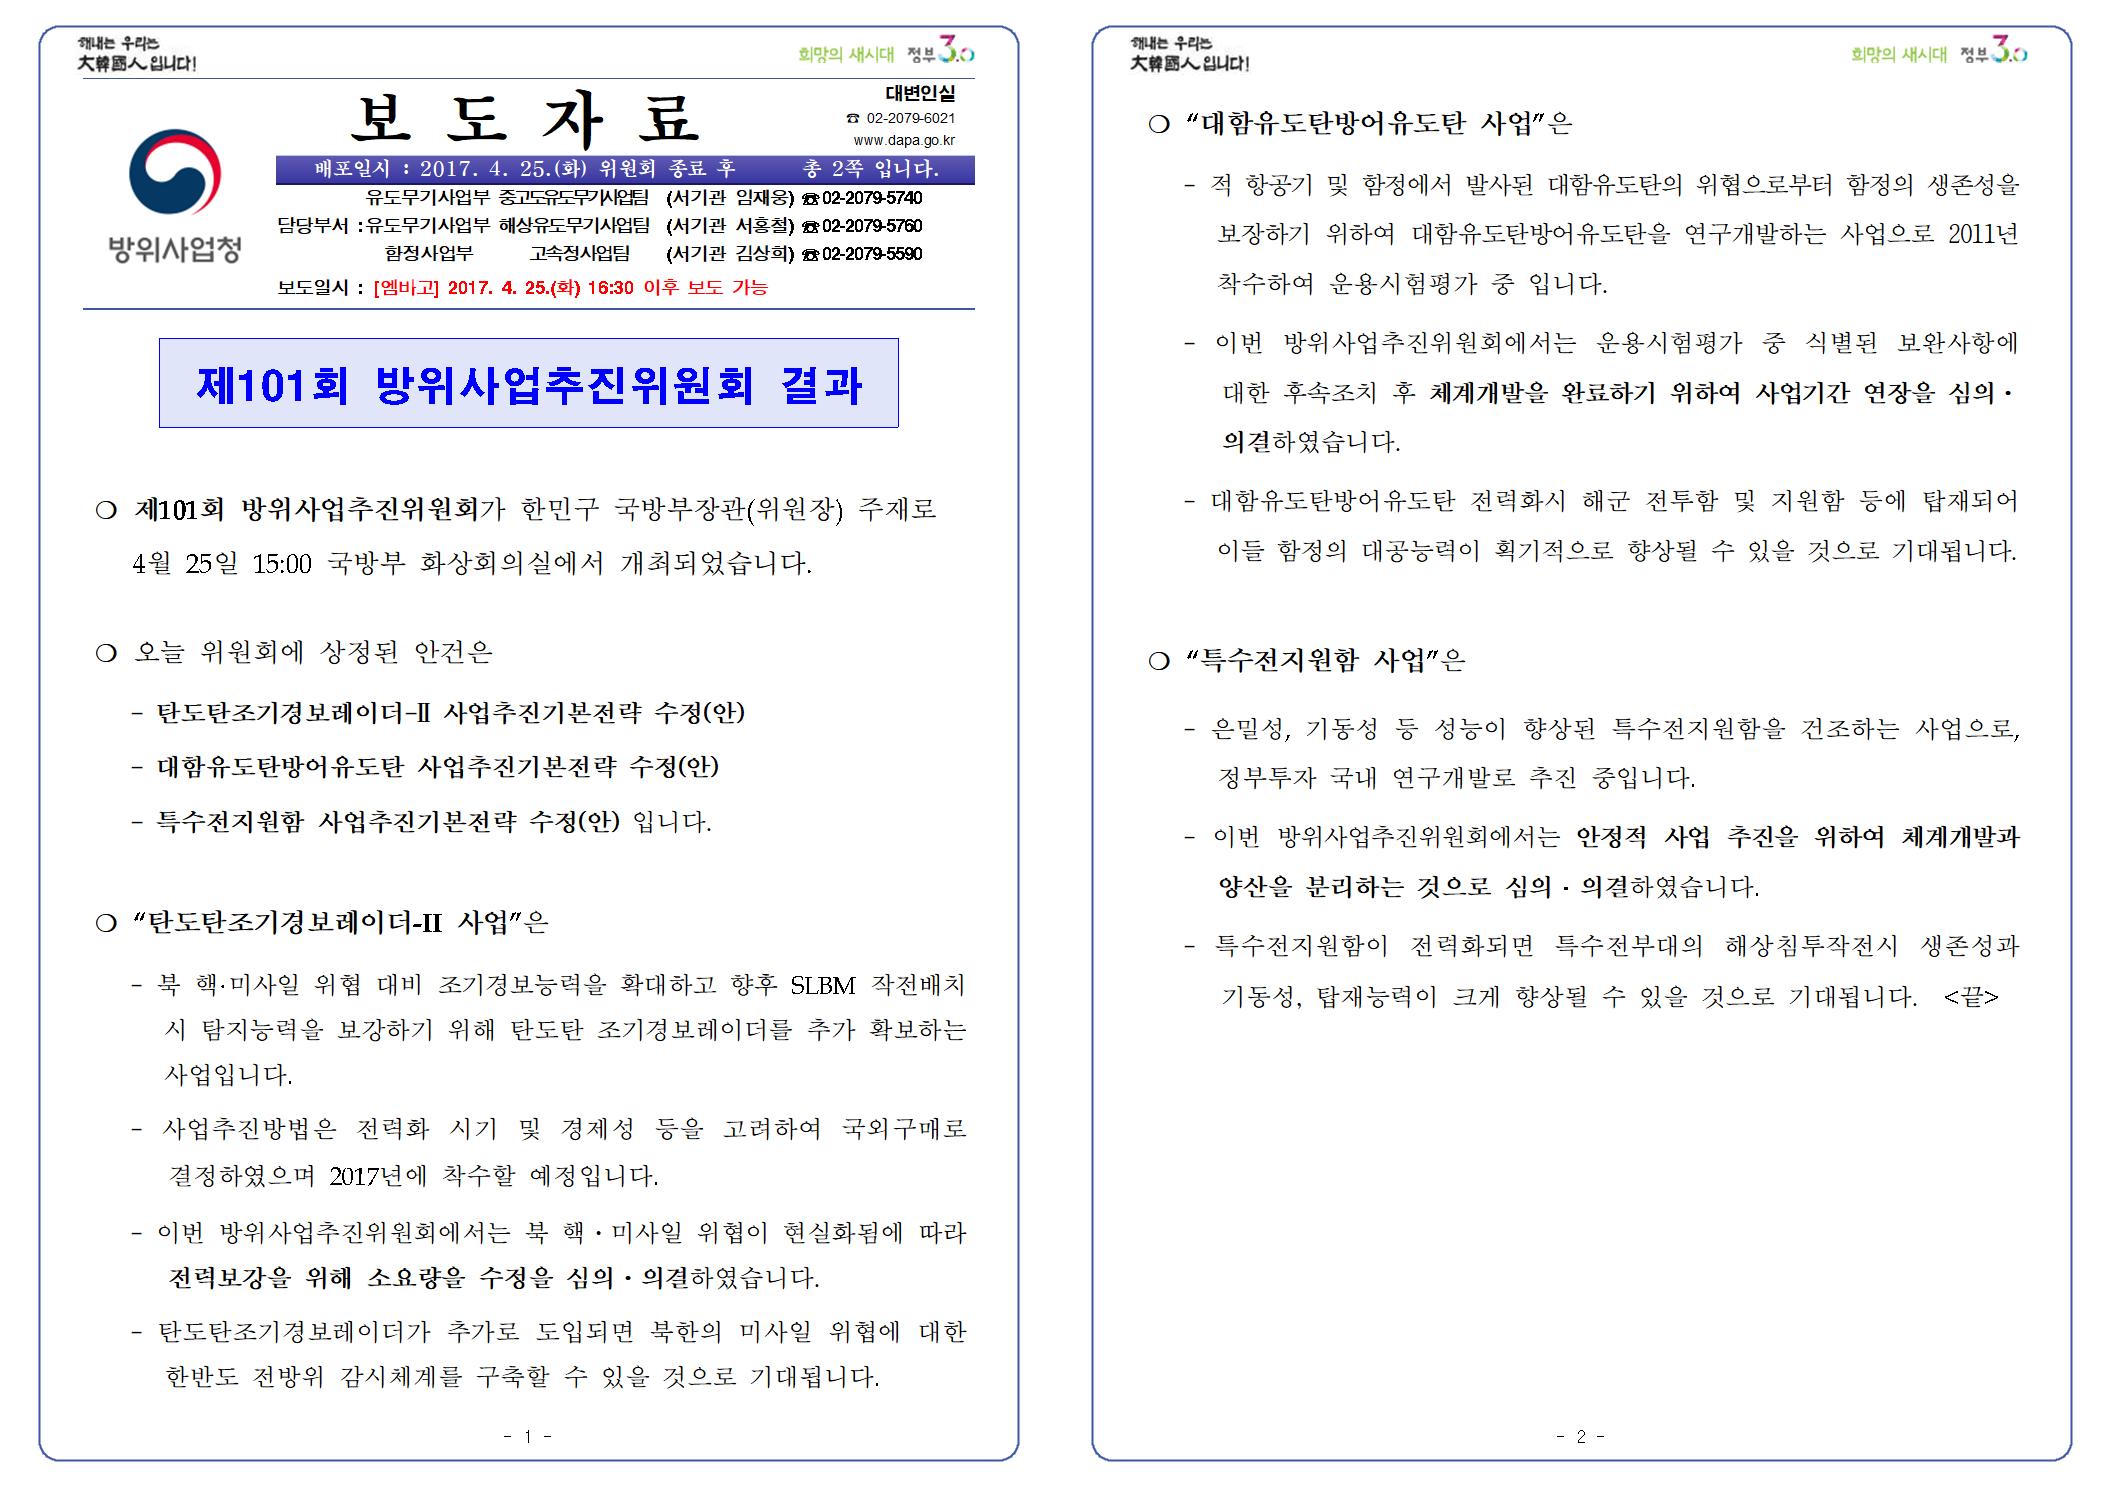 170425 %5B보도자료%5D 제101회 방위사업추진위원회 개최 결과001.png